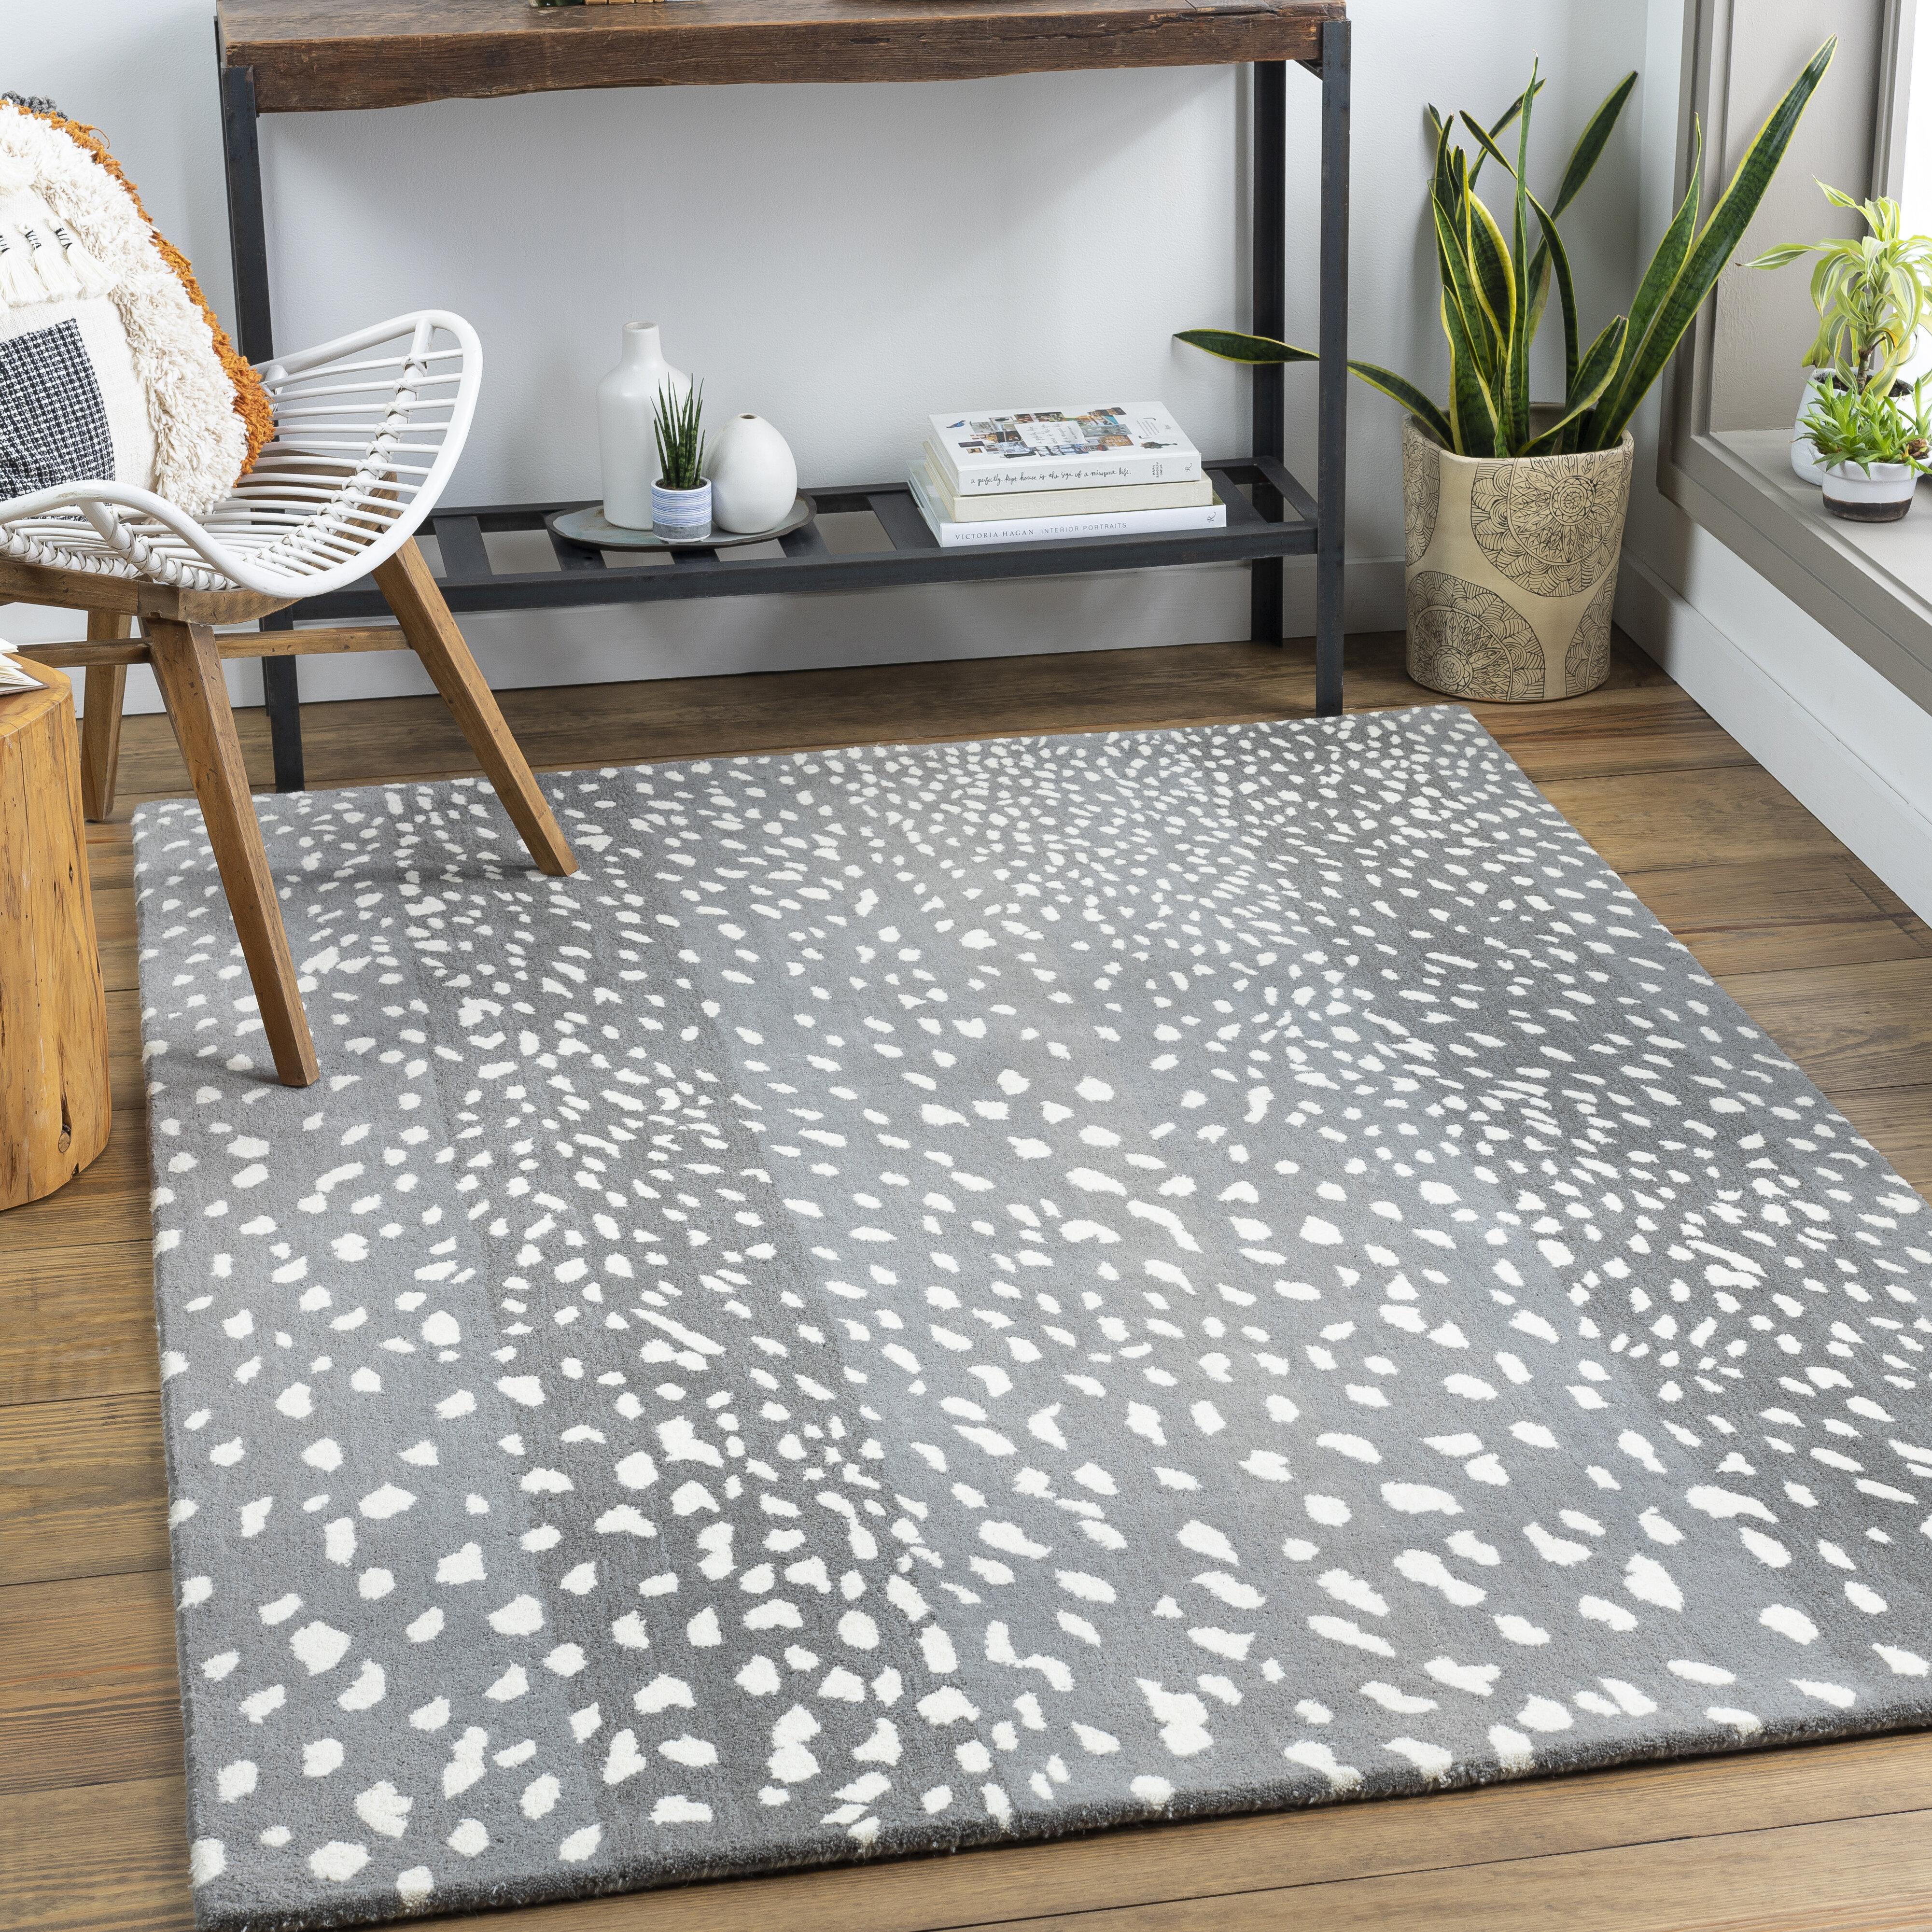 10 X 14 Animal Print Area Rugs You Ll Love In 2021 Wayfair